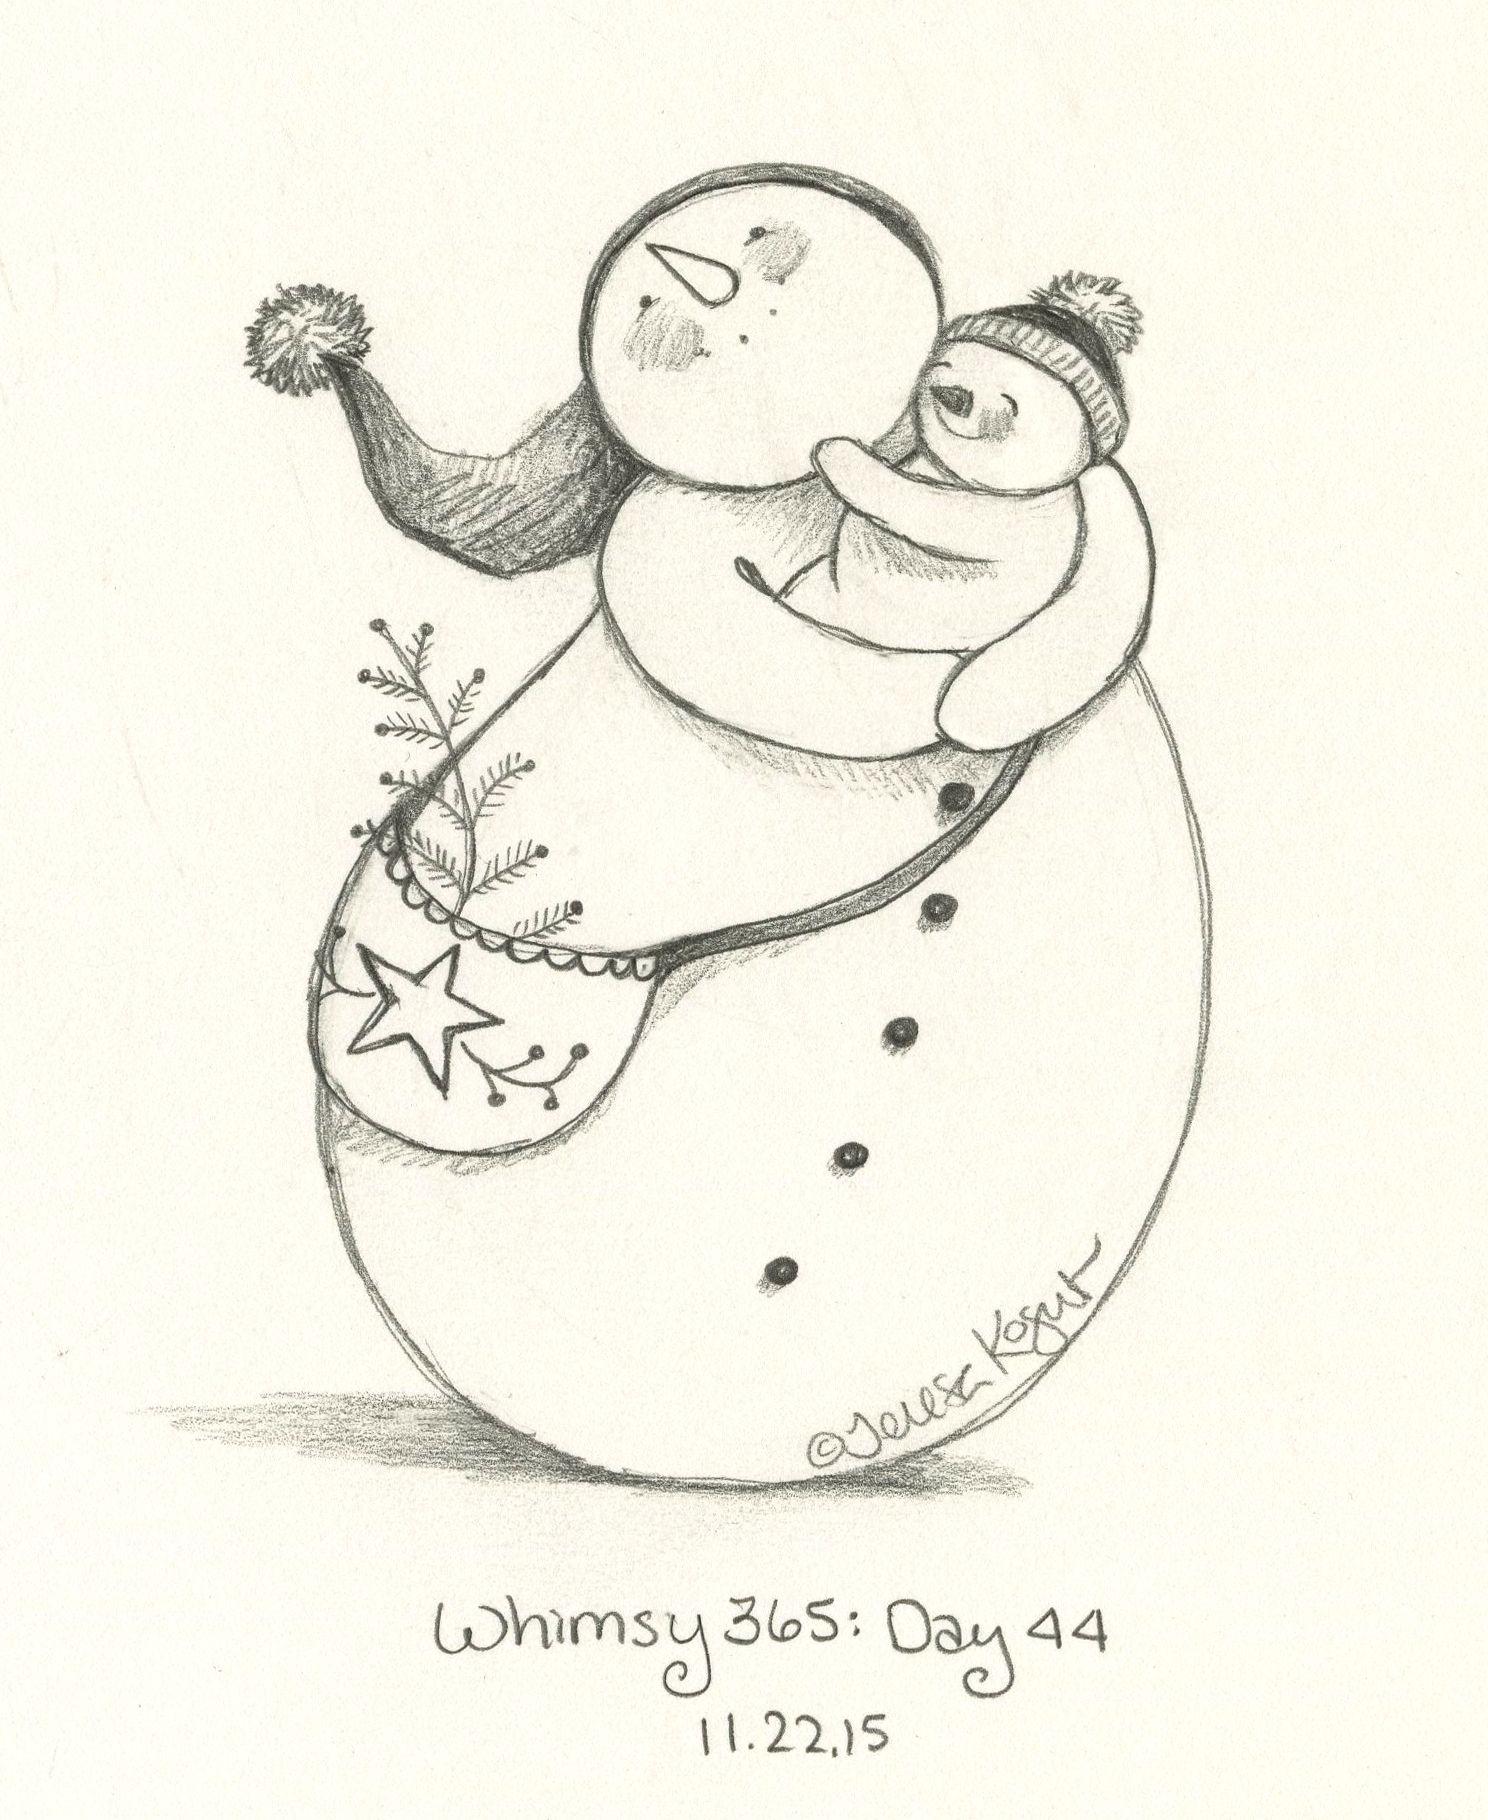 whimsy 365 day 44 112215 | Punch needle | Pinterest | Bordado ...